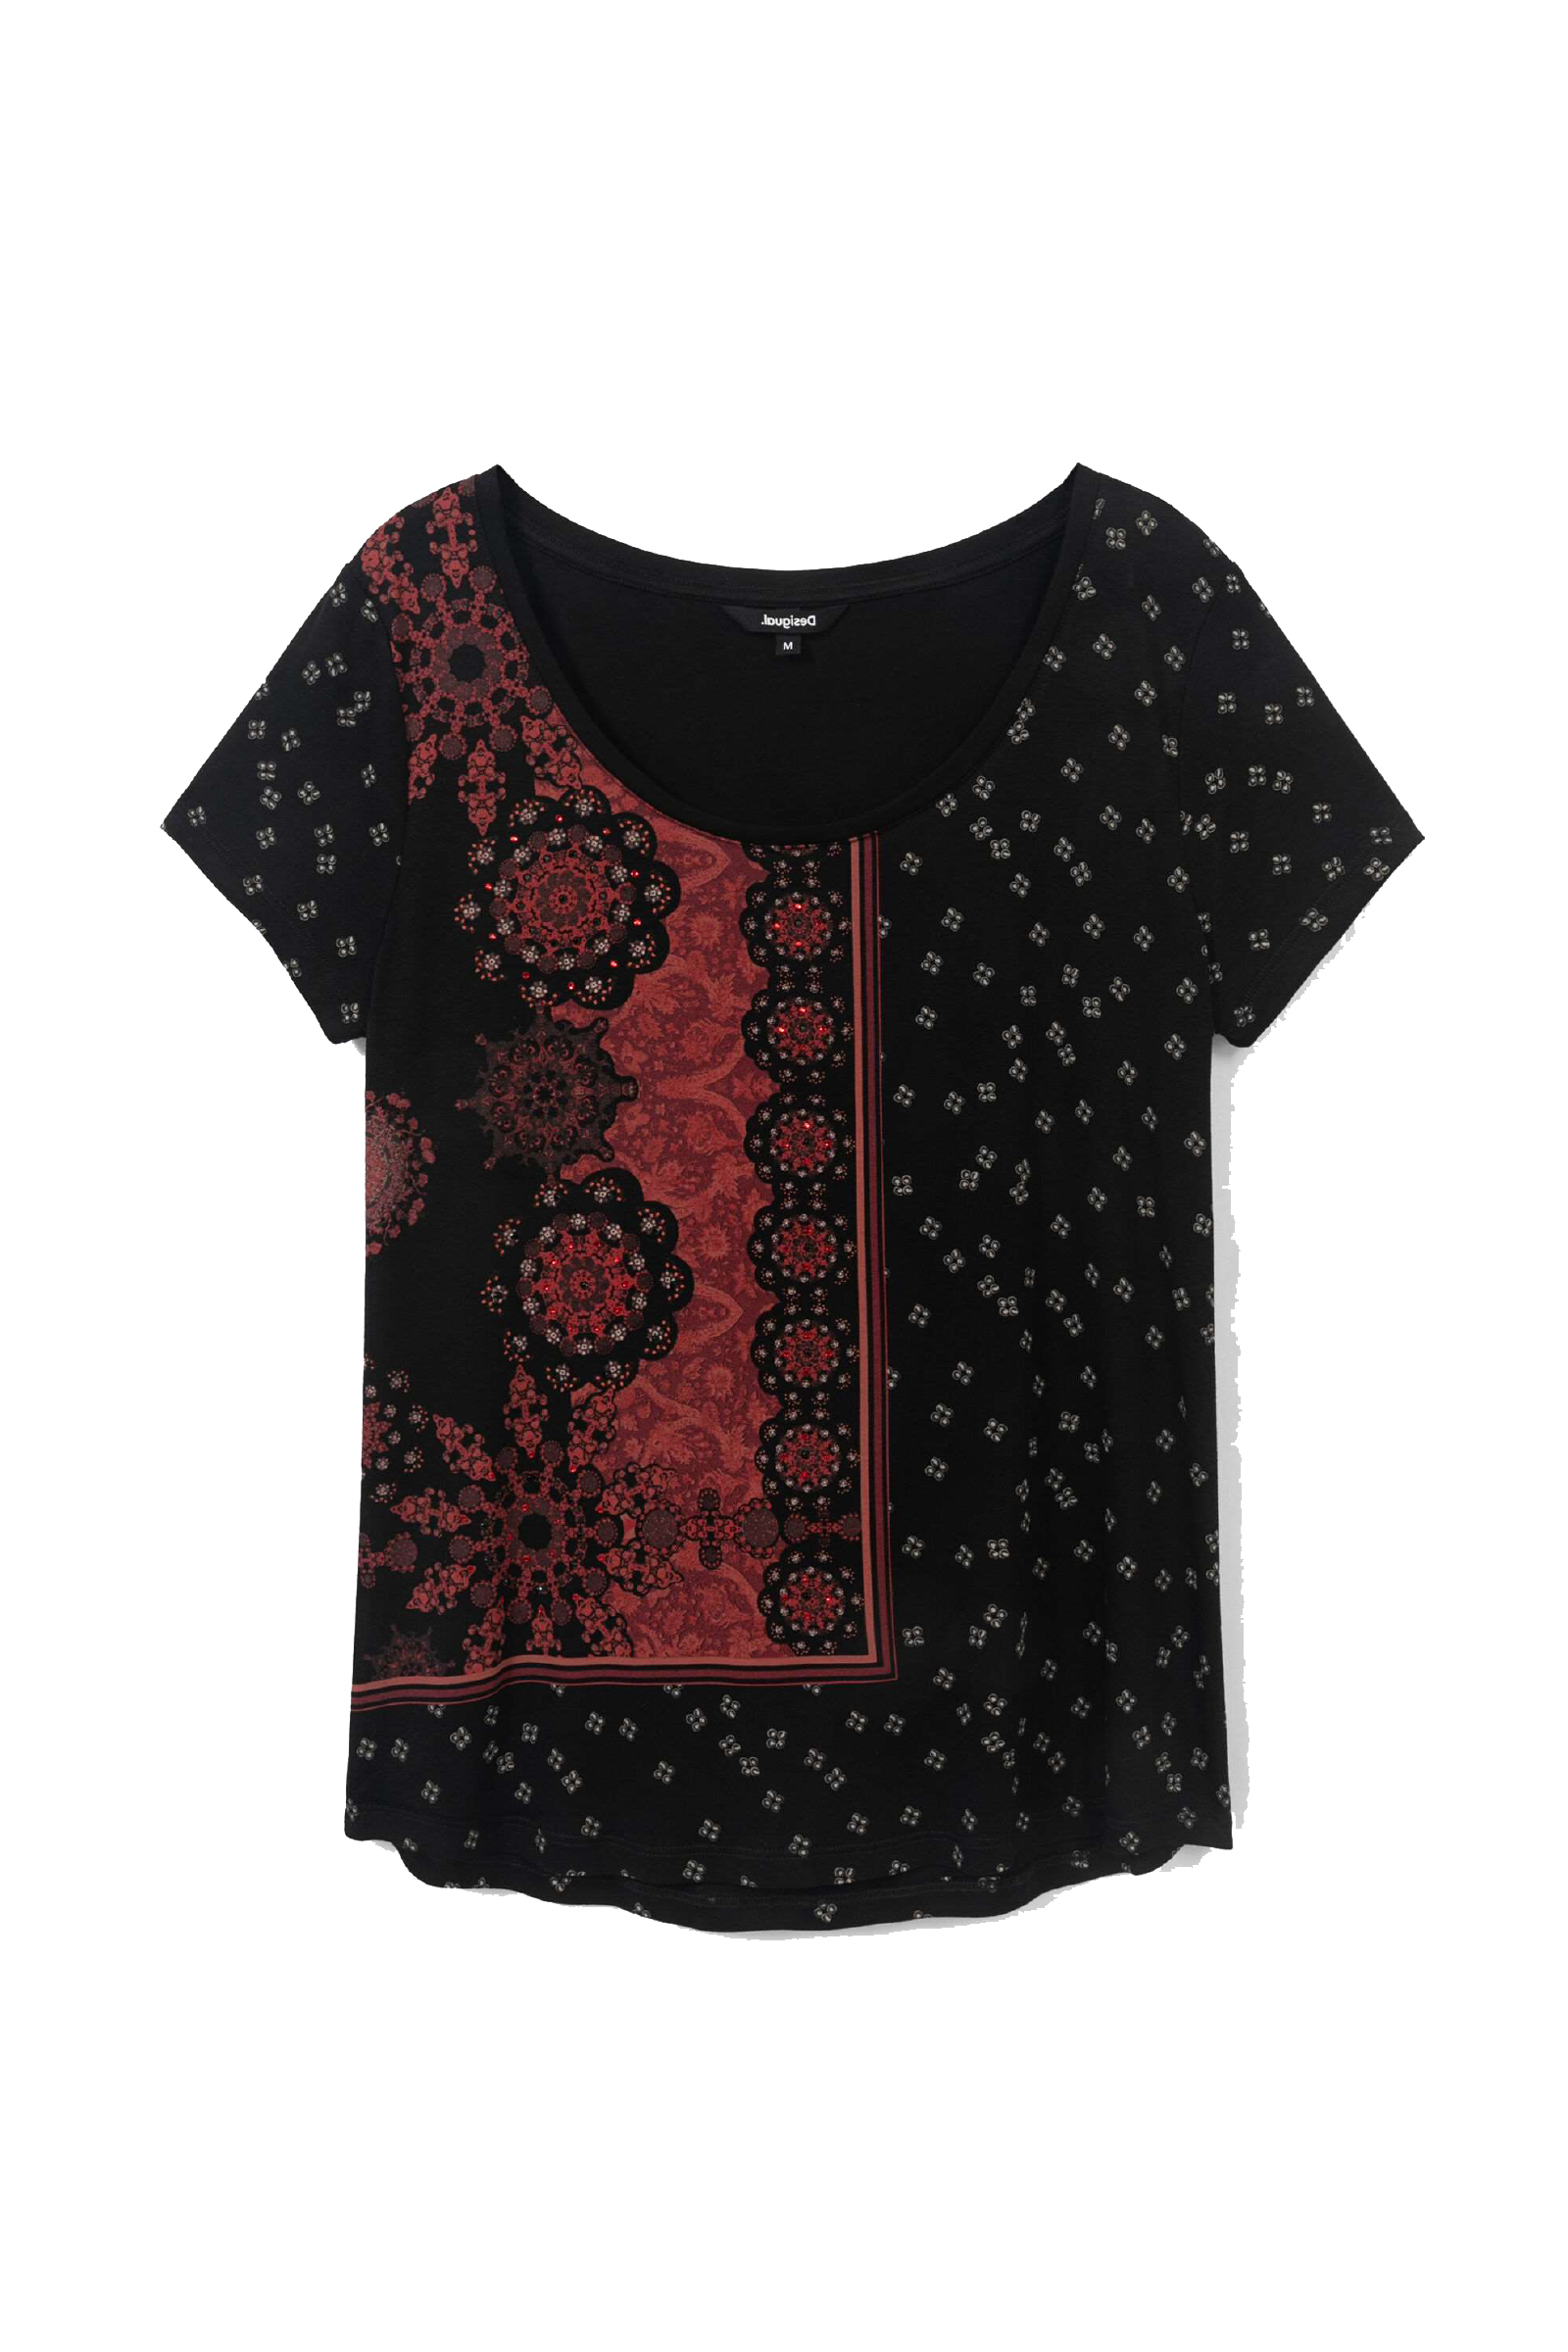 T-Shirt Modello ESTAMBUL DESIGUAL | T-Shirt | 21SWTK652000